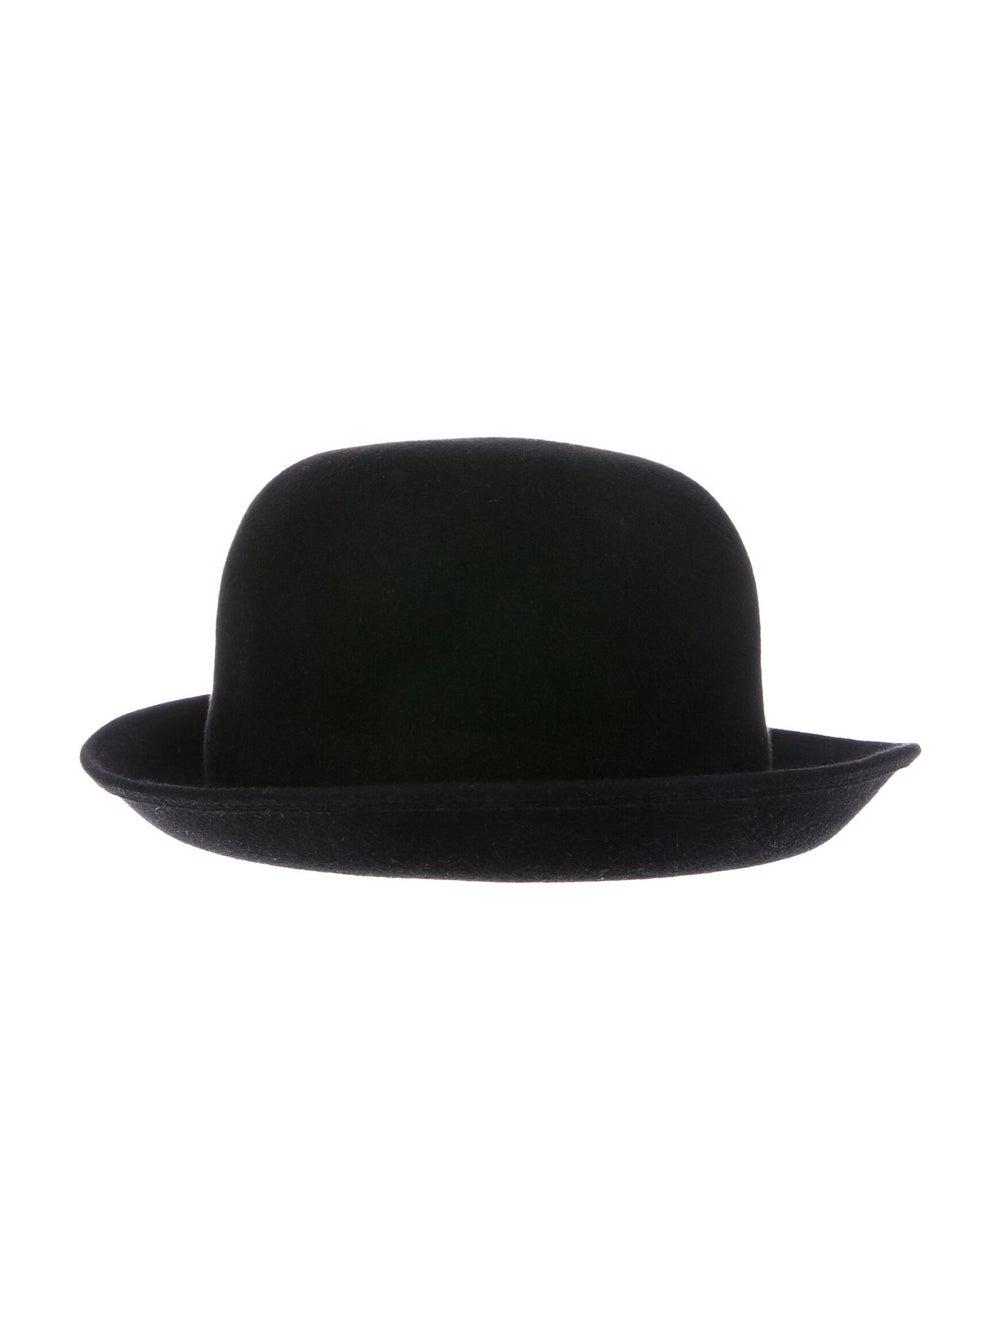 Patricia Underwood Felt Bowler Hat Black - image 2